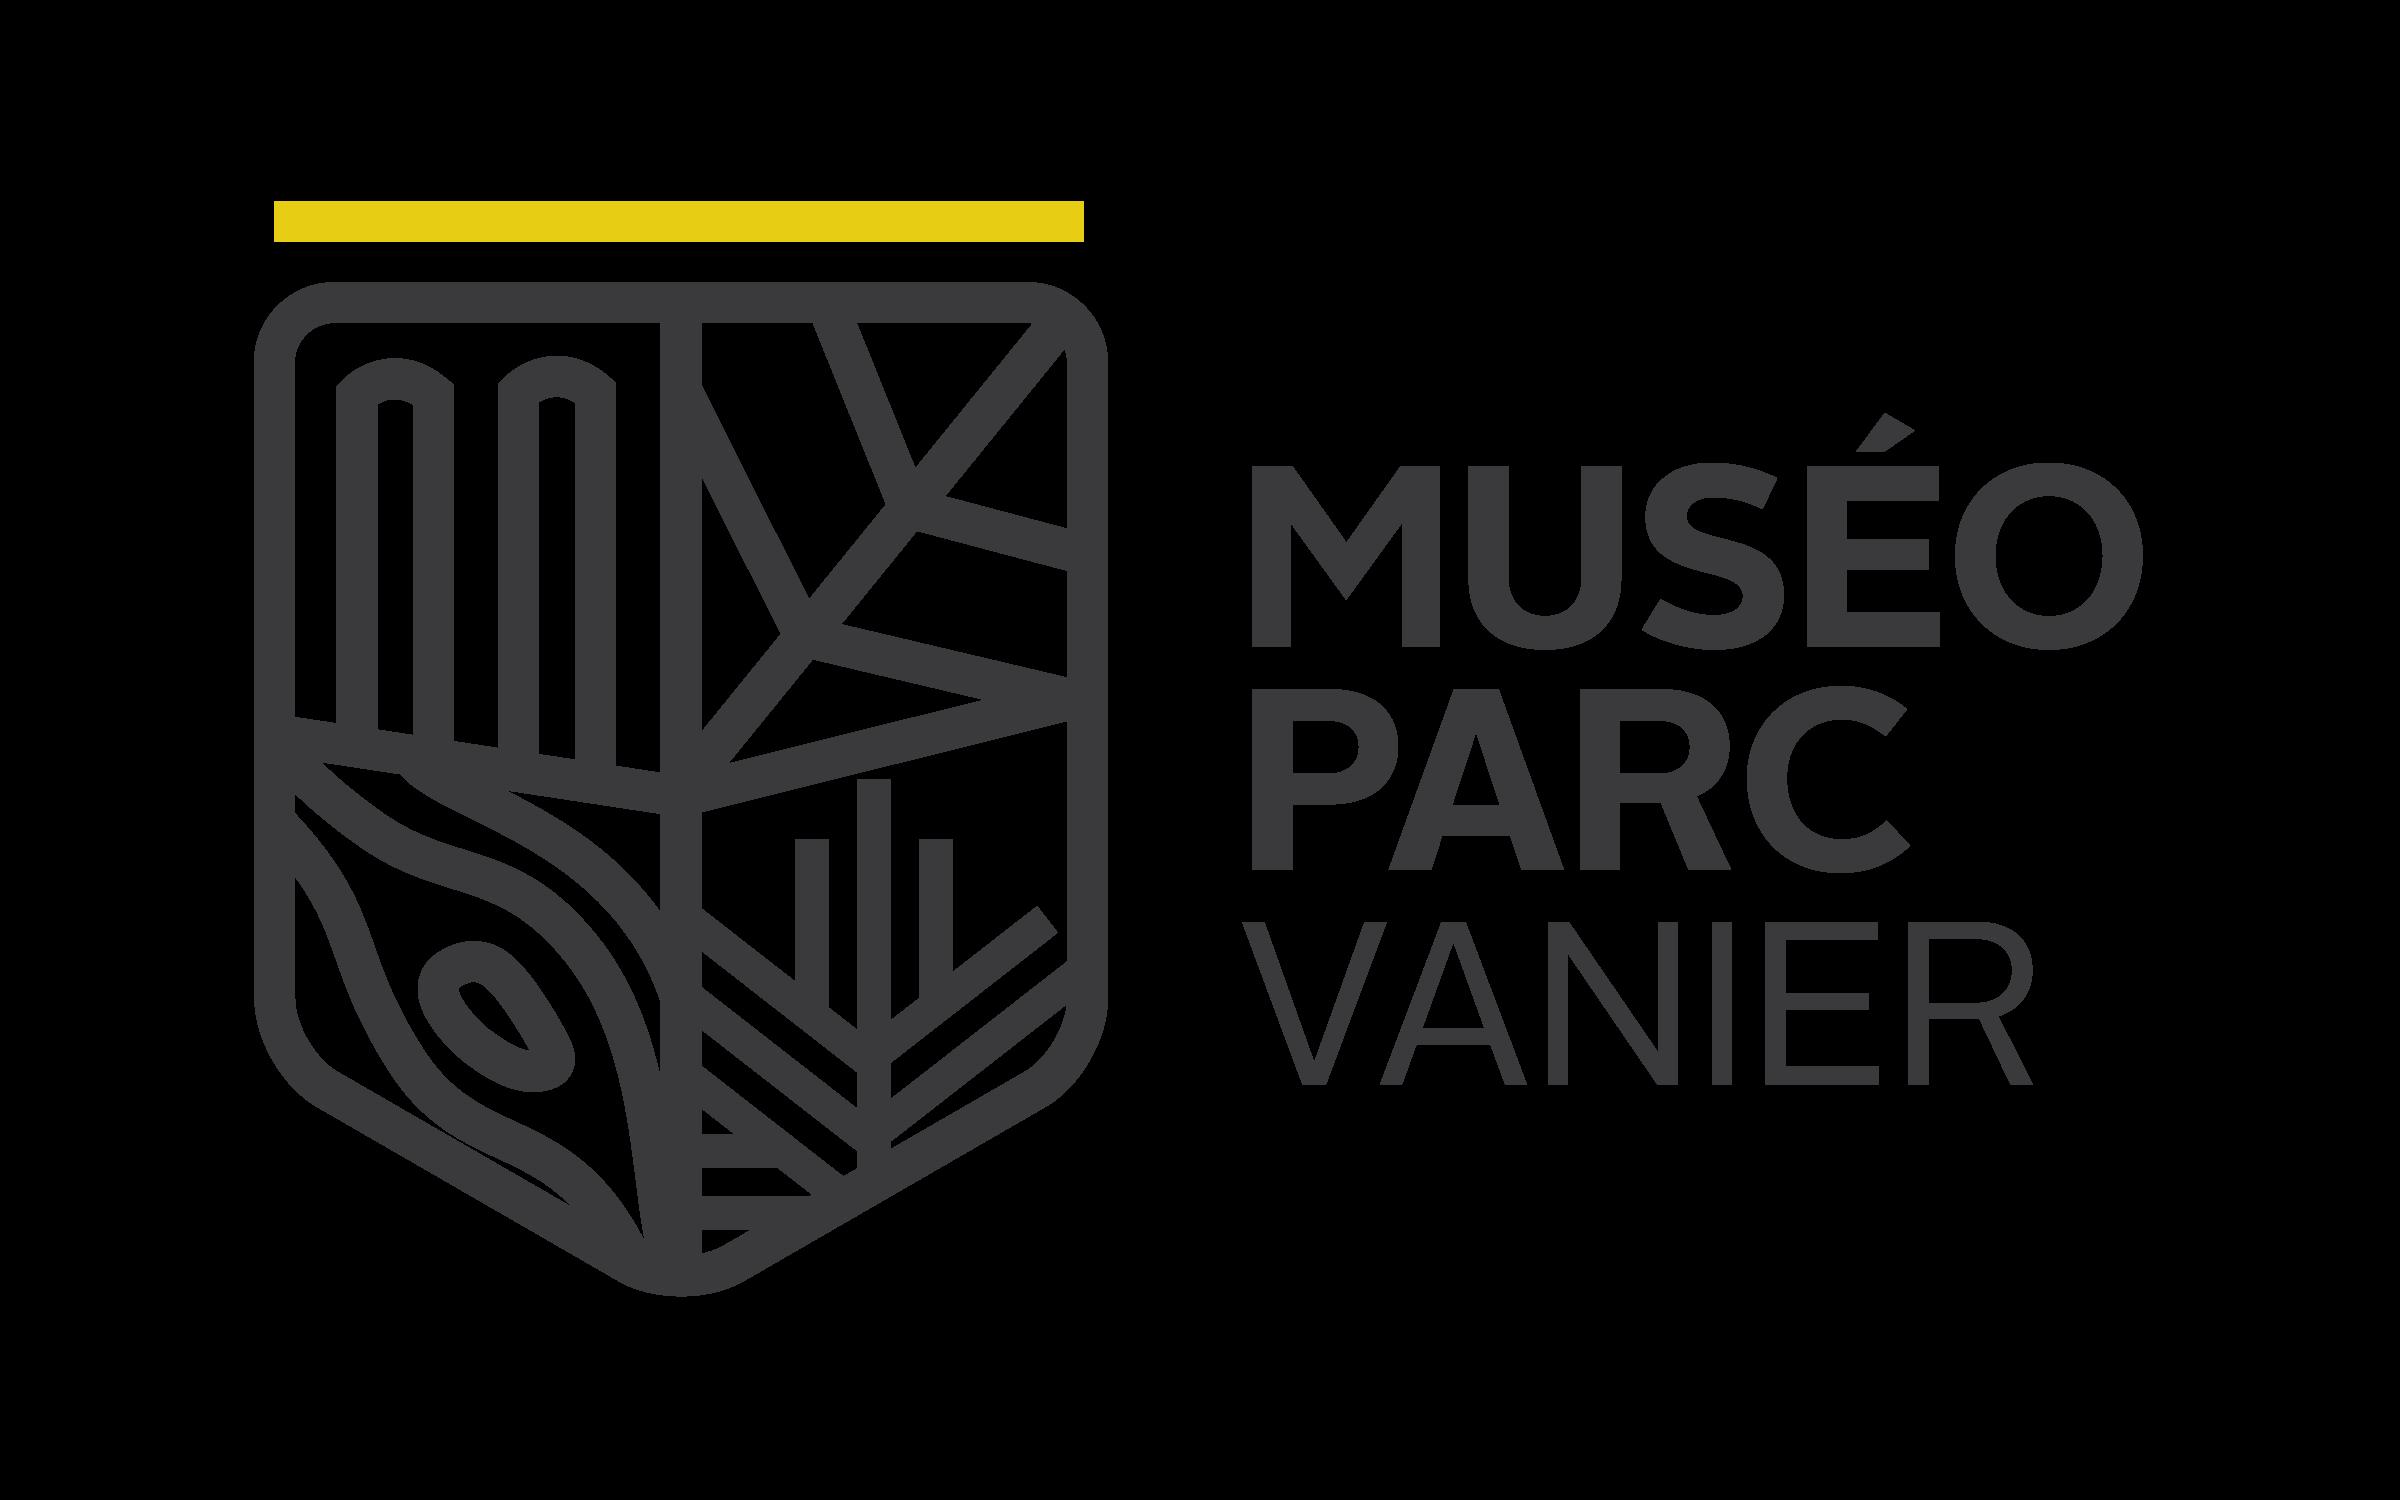 LOGO-MUSEO-PARC-VANIER